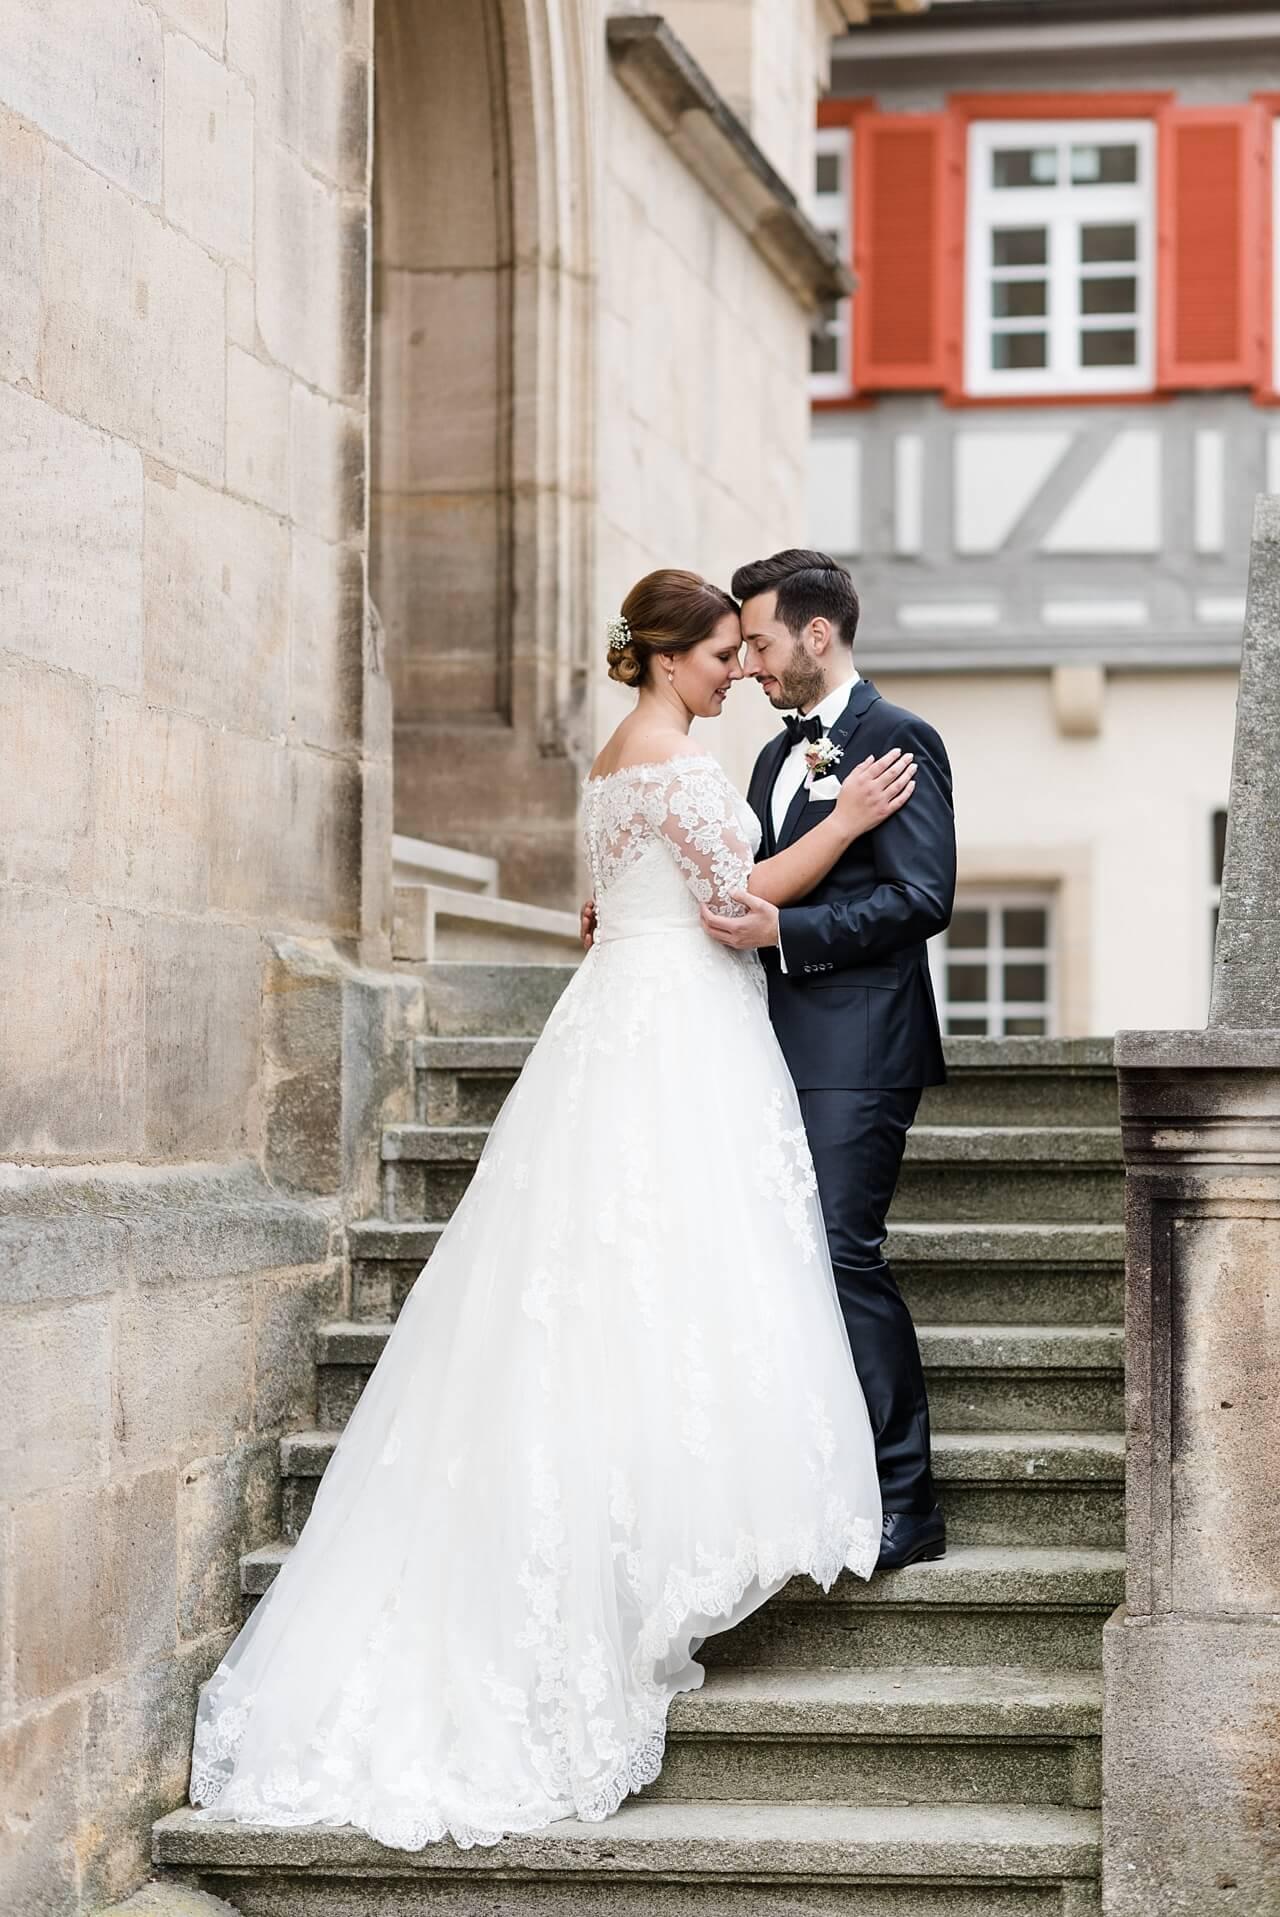 Rebecca Conte Fotografie: Herbsthochzeit Schloss Koengen 46